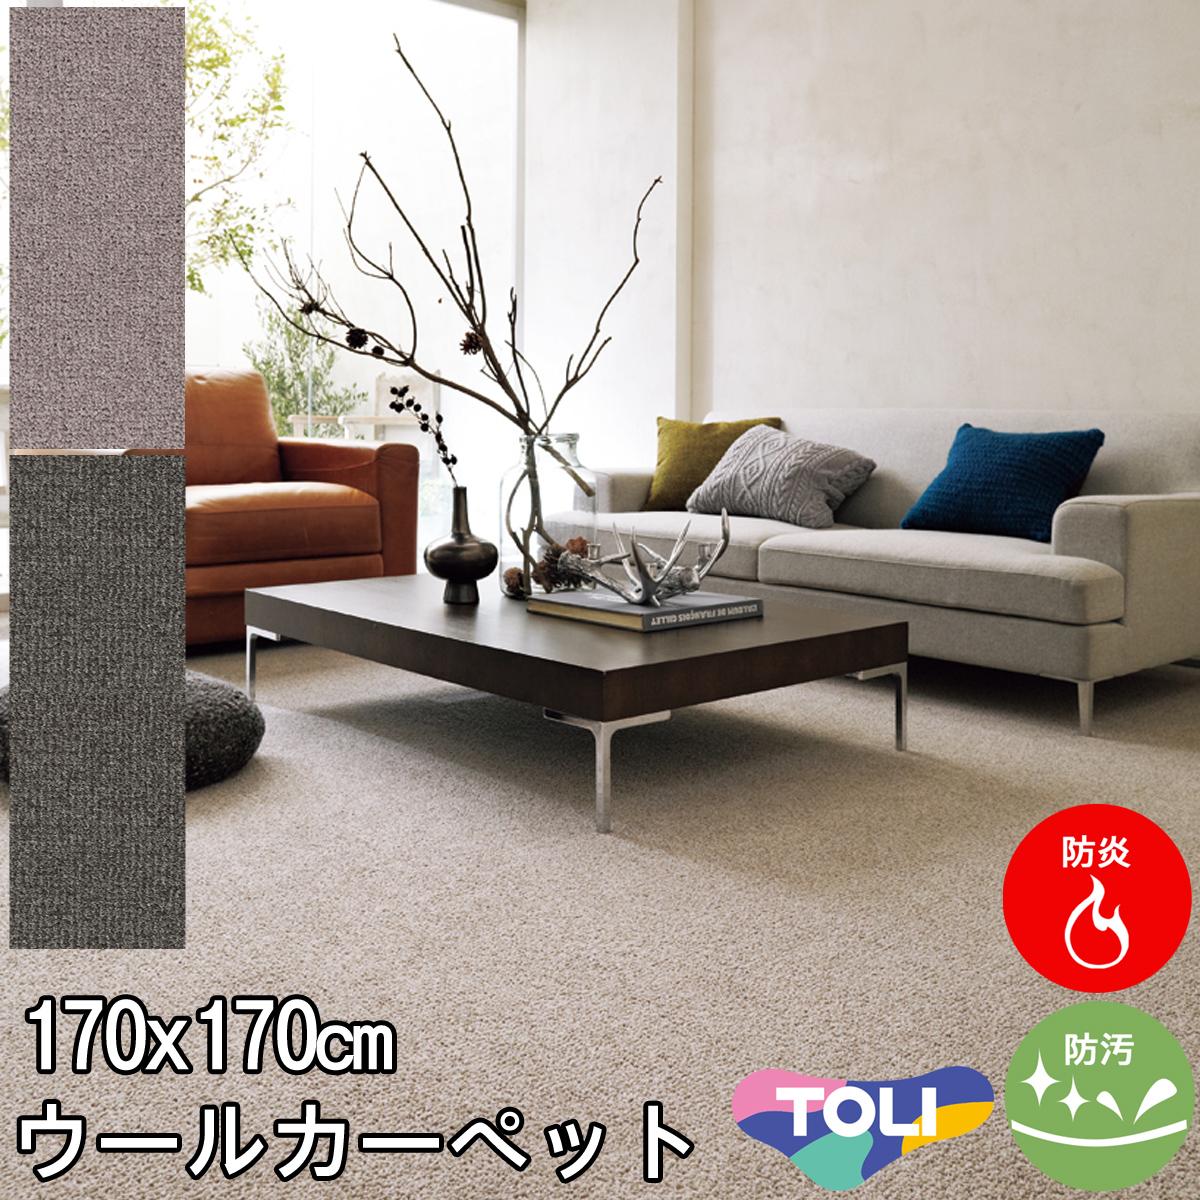 11d9b69c319 東リ ラグ 楕円 太さの違うパイルが表情豊かなウールカーペット 2帖絨毯 ...